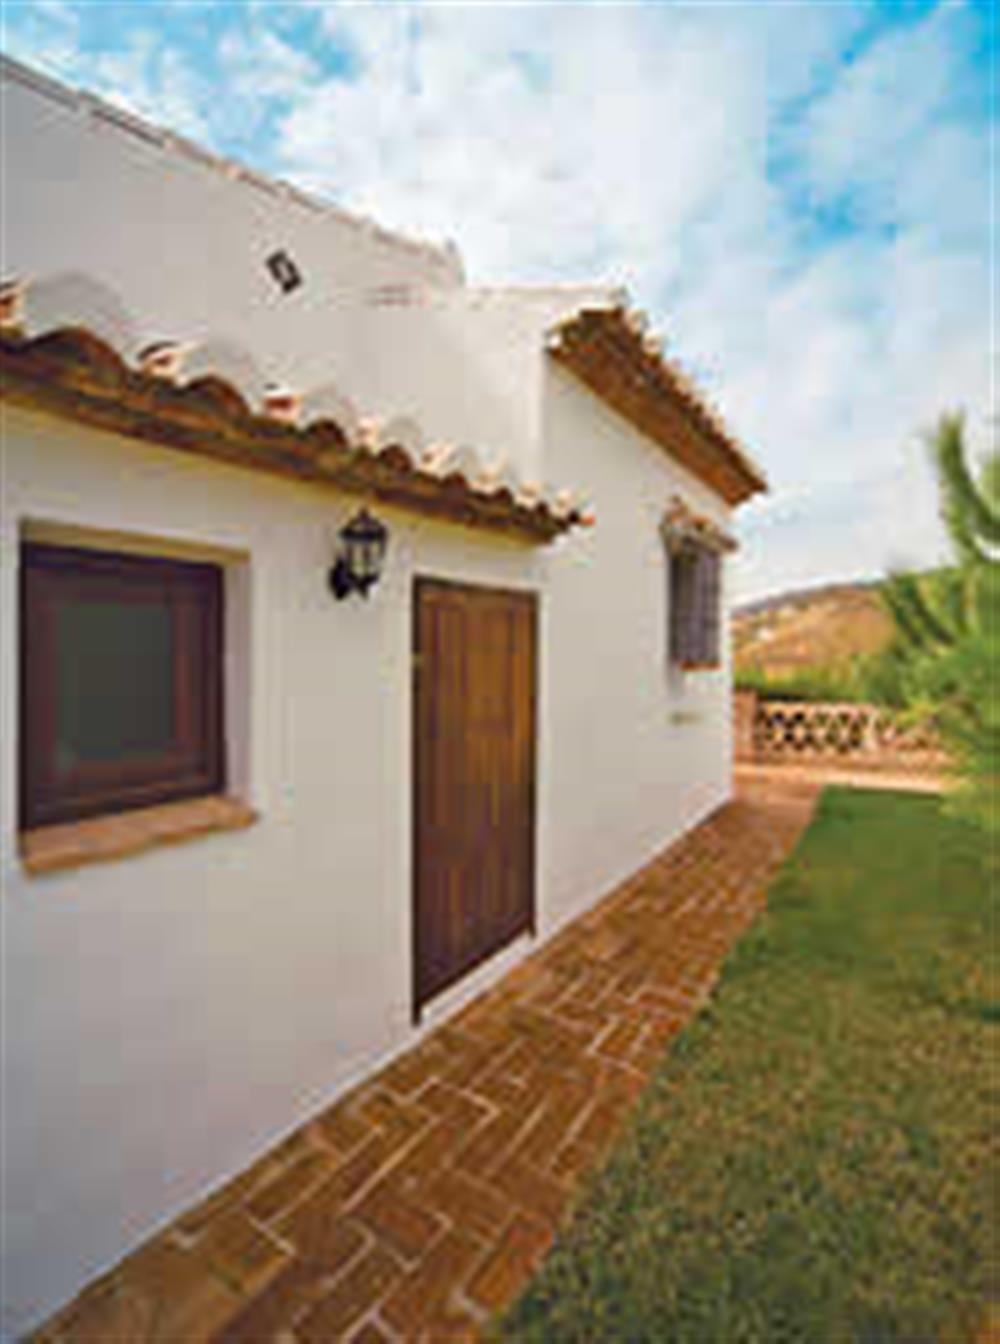 Villa exterior at Villa Casa Jorge, Frigiliana, Andalucia, Spain